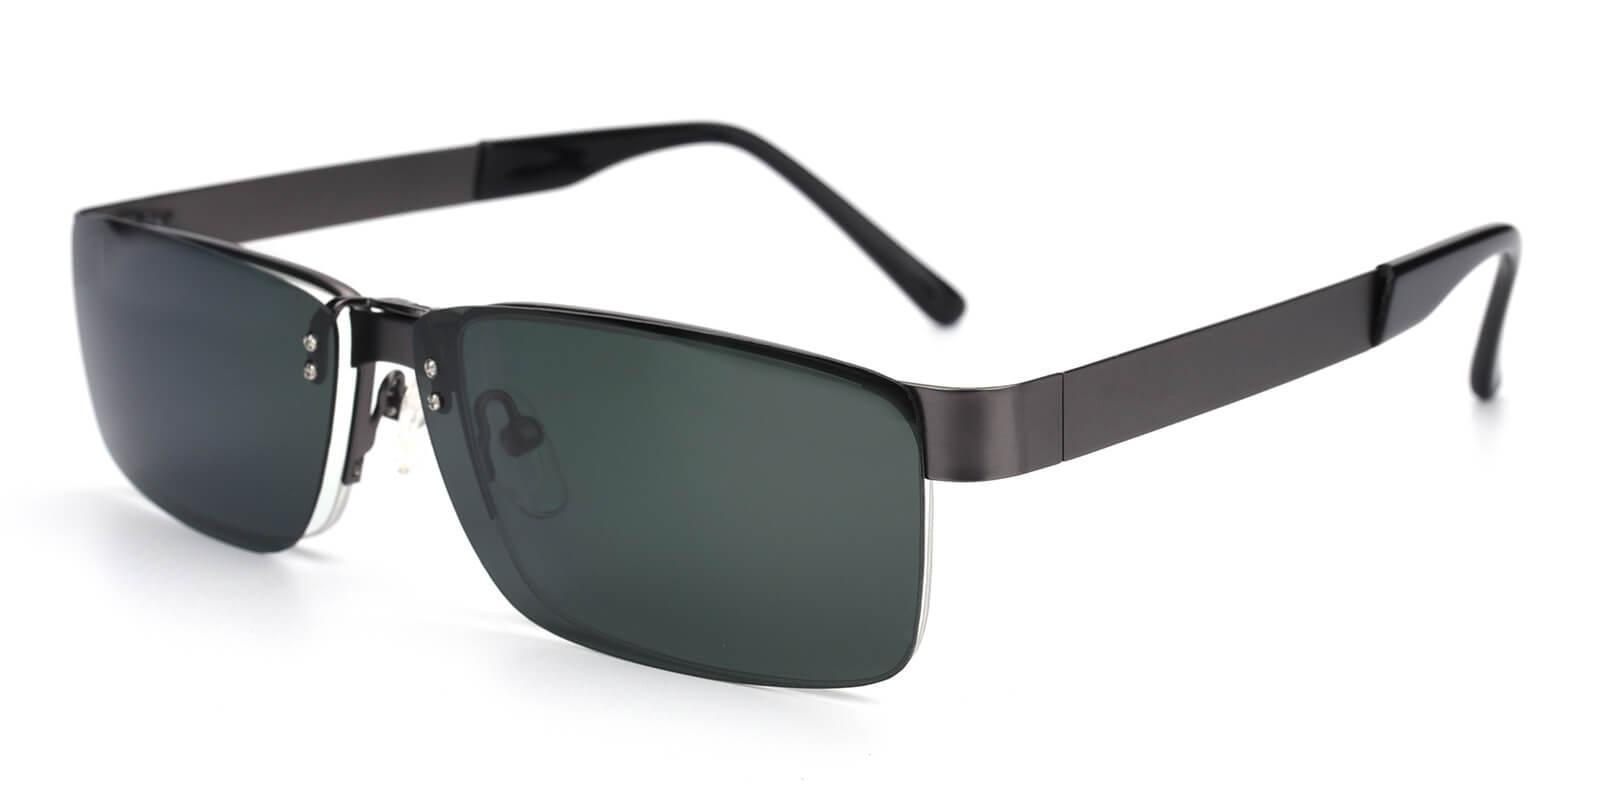 Sparkle-Gun-Rectangle-Metal-Eyeglasses-additional1